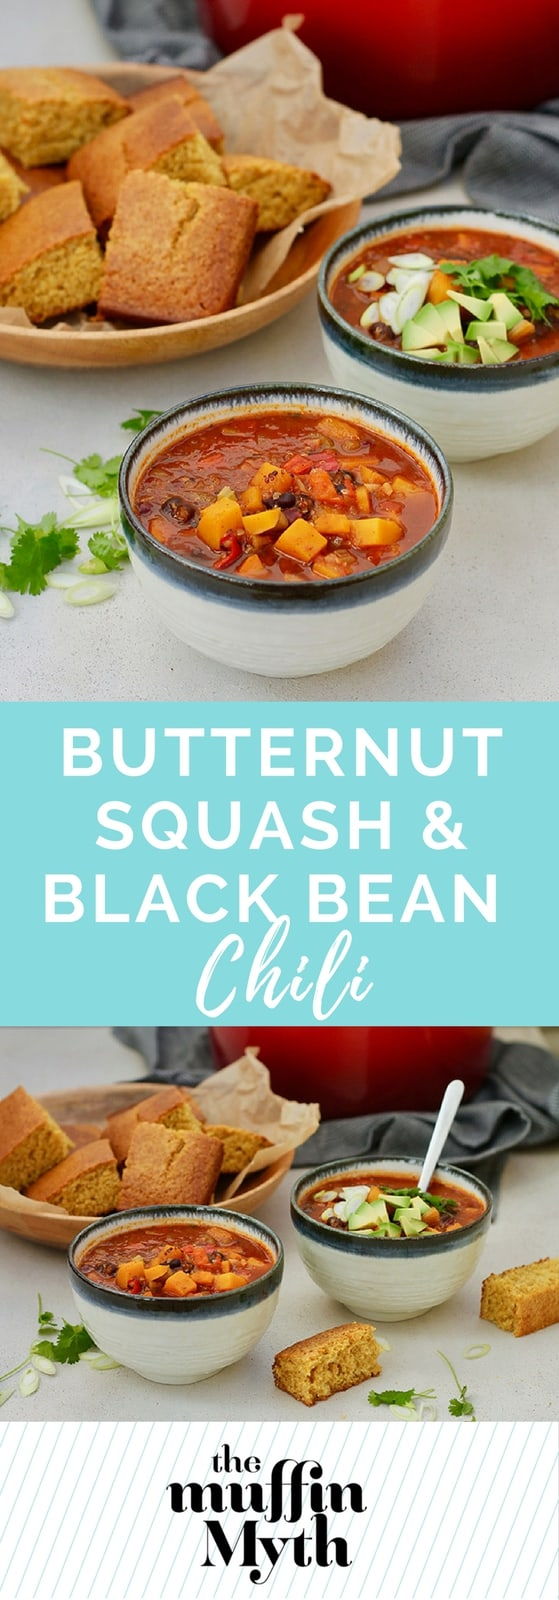 Butternut Squash and Black Bean Chili with quinoa // www.heynutritionlady.com #vegan #chili #butternutsquash